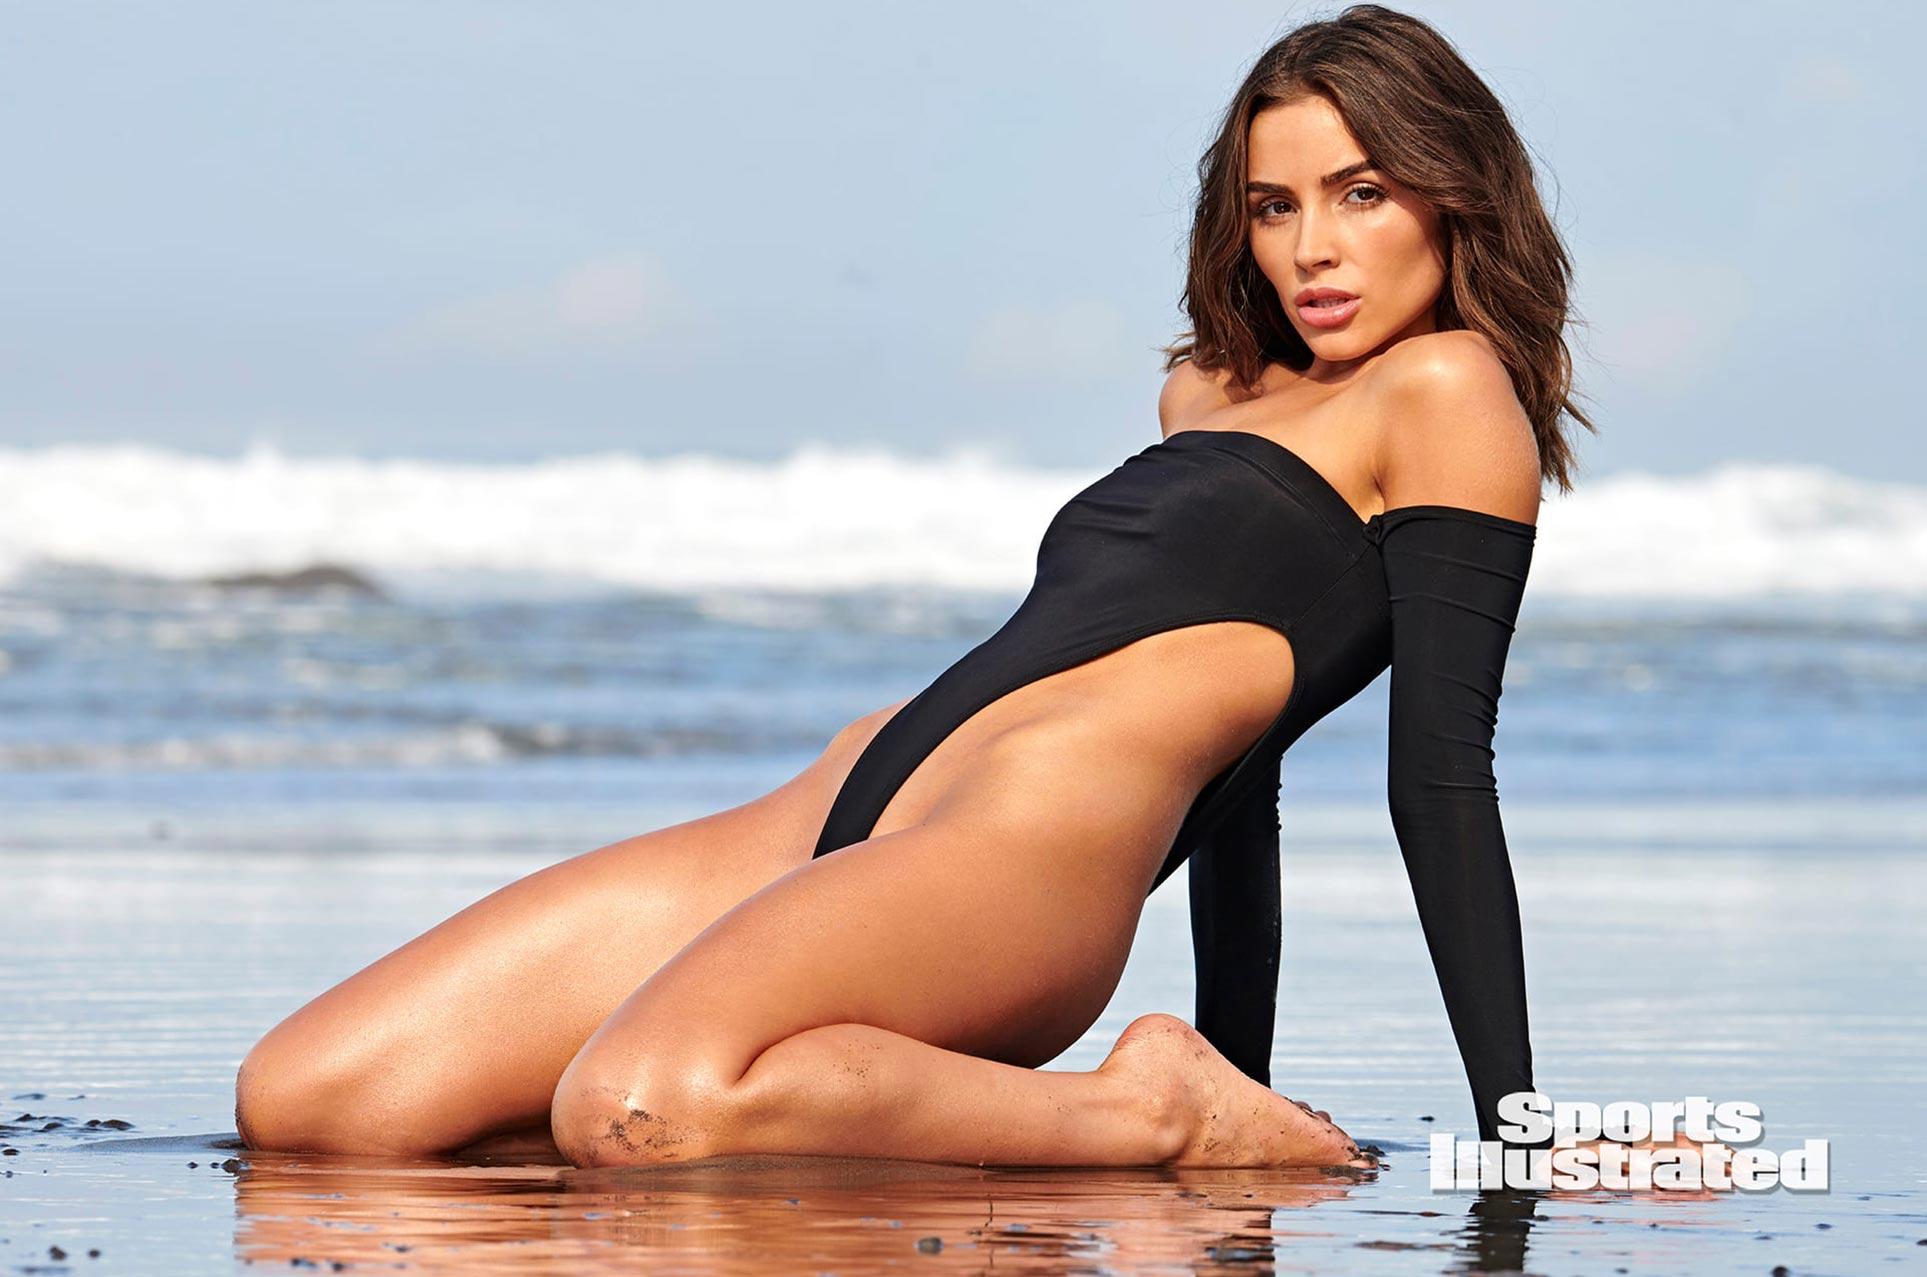 Оливия Калпо в каталоге купальников Sports Illustrated Swimsuit 2020 / фото 09